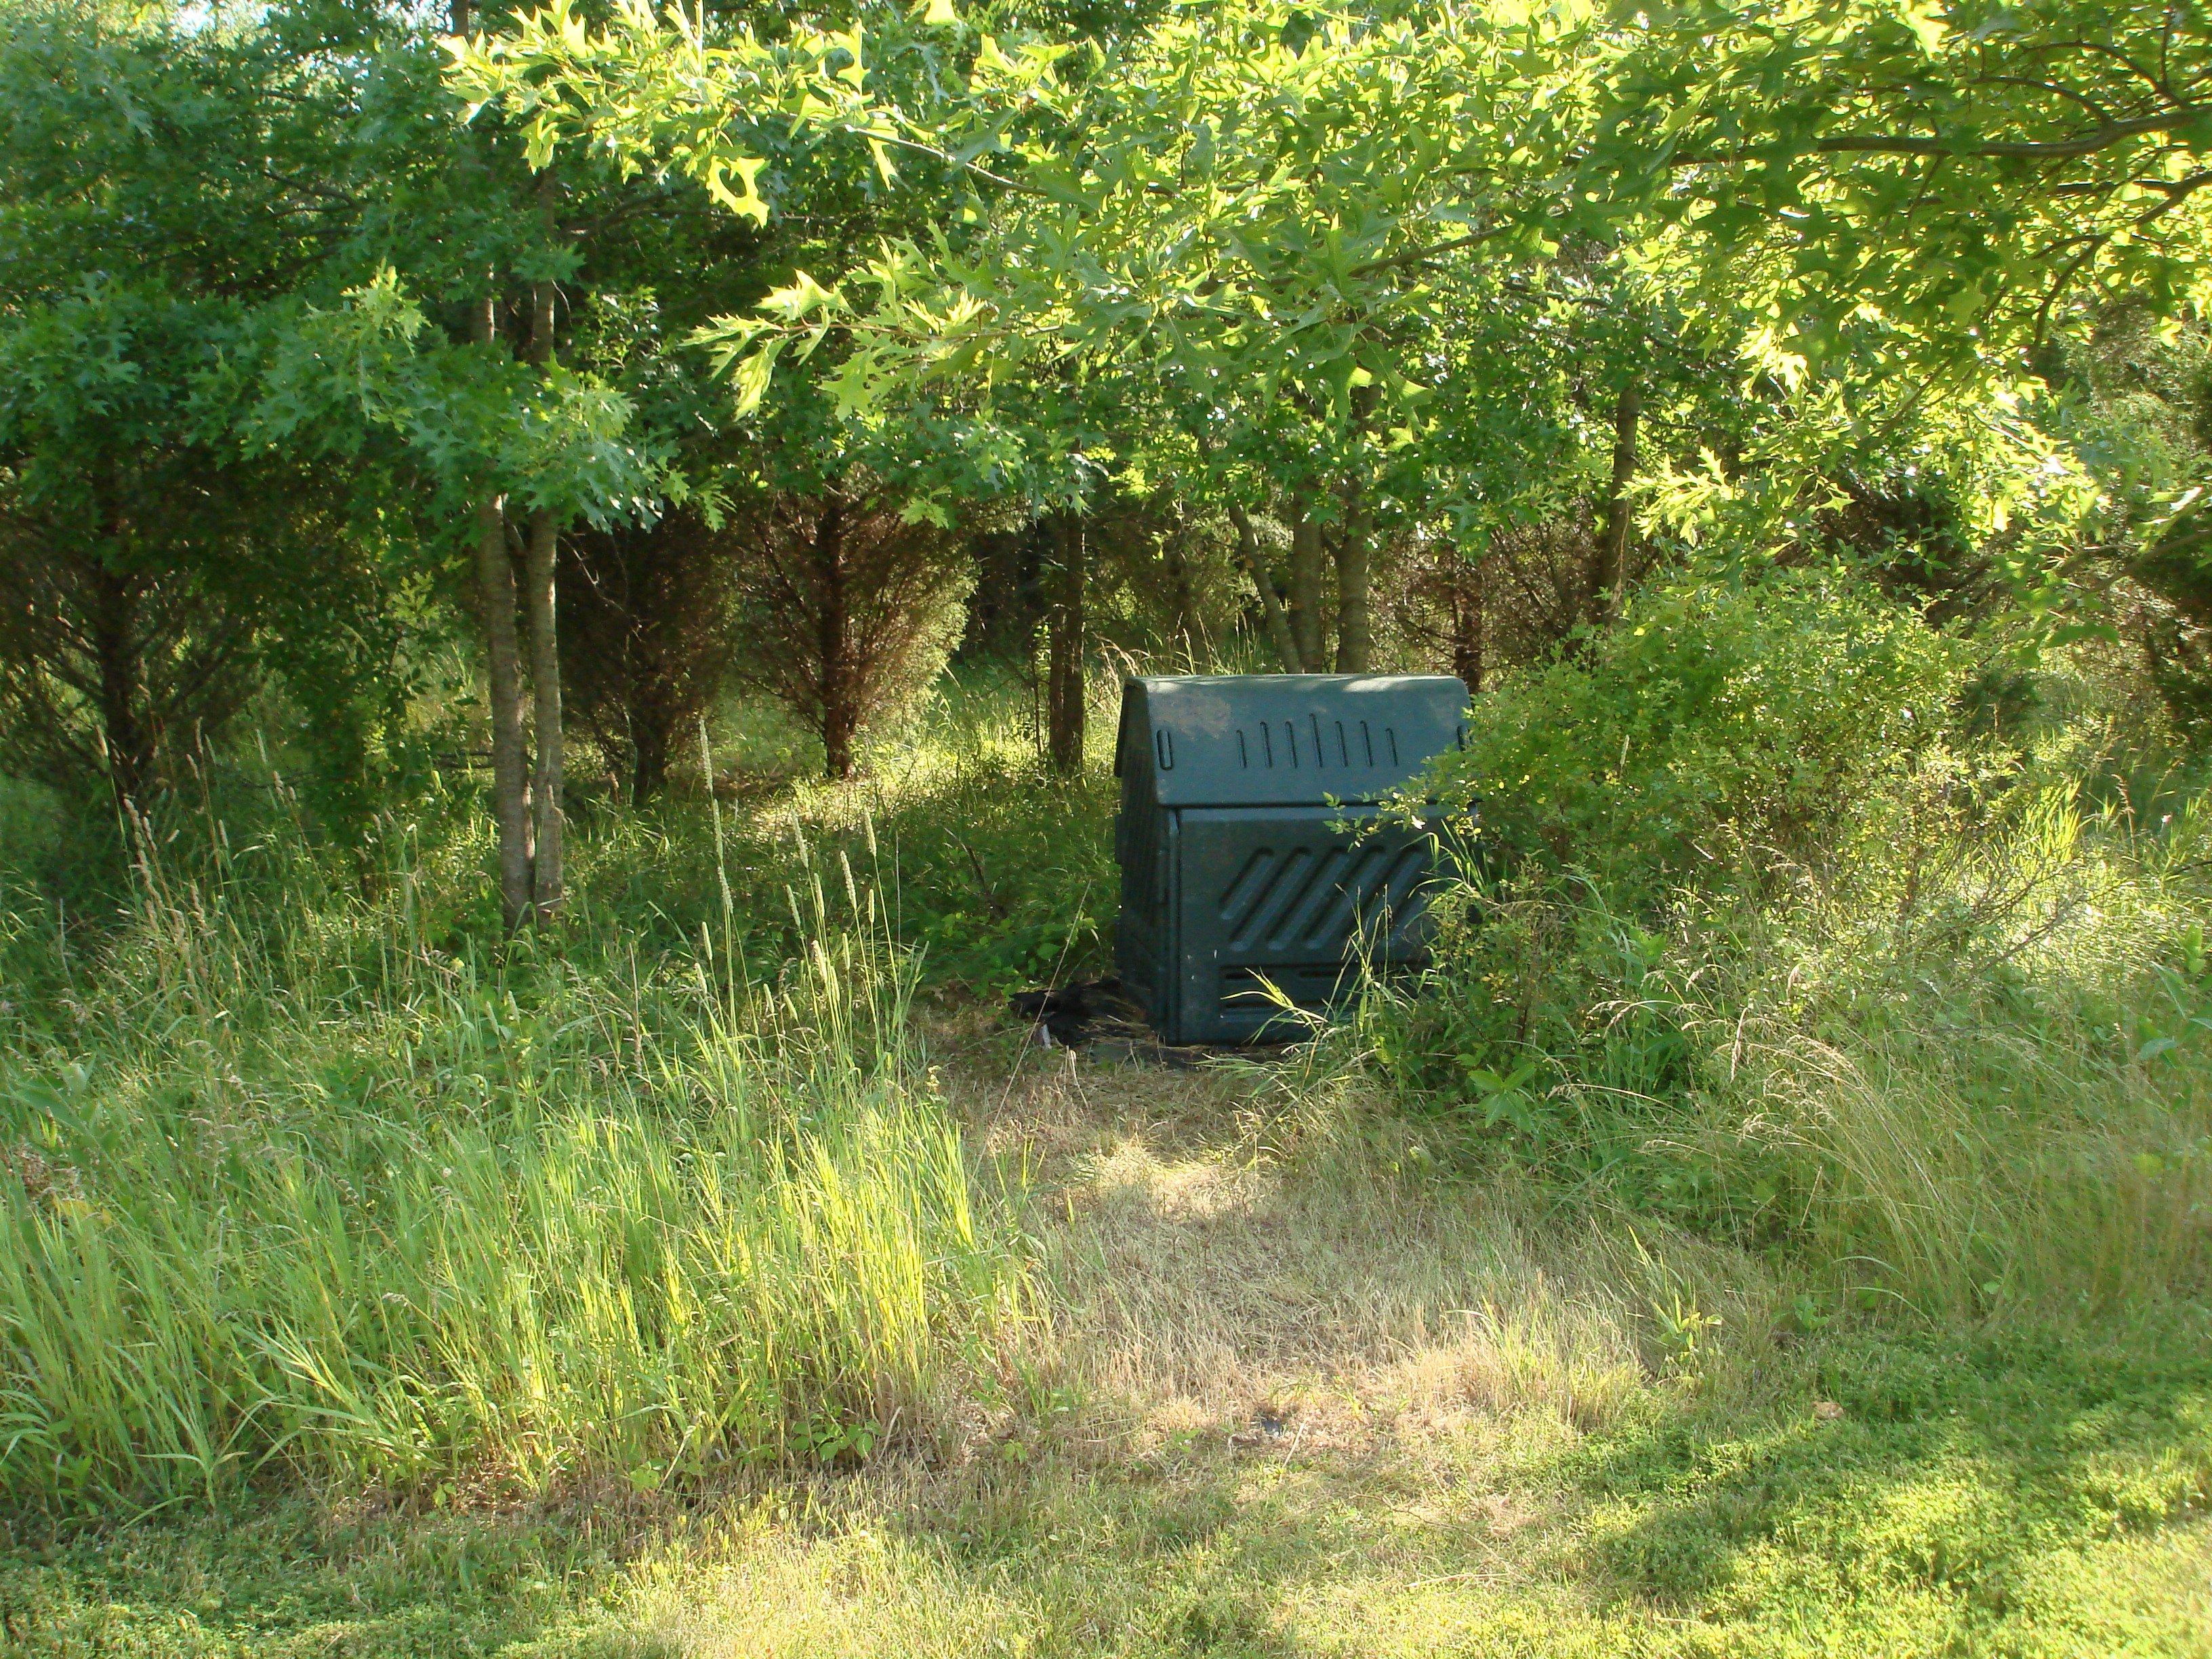 Green_compost_bin